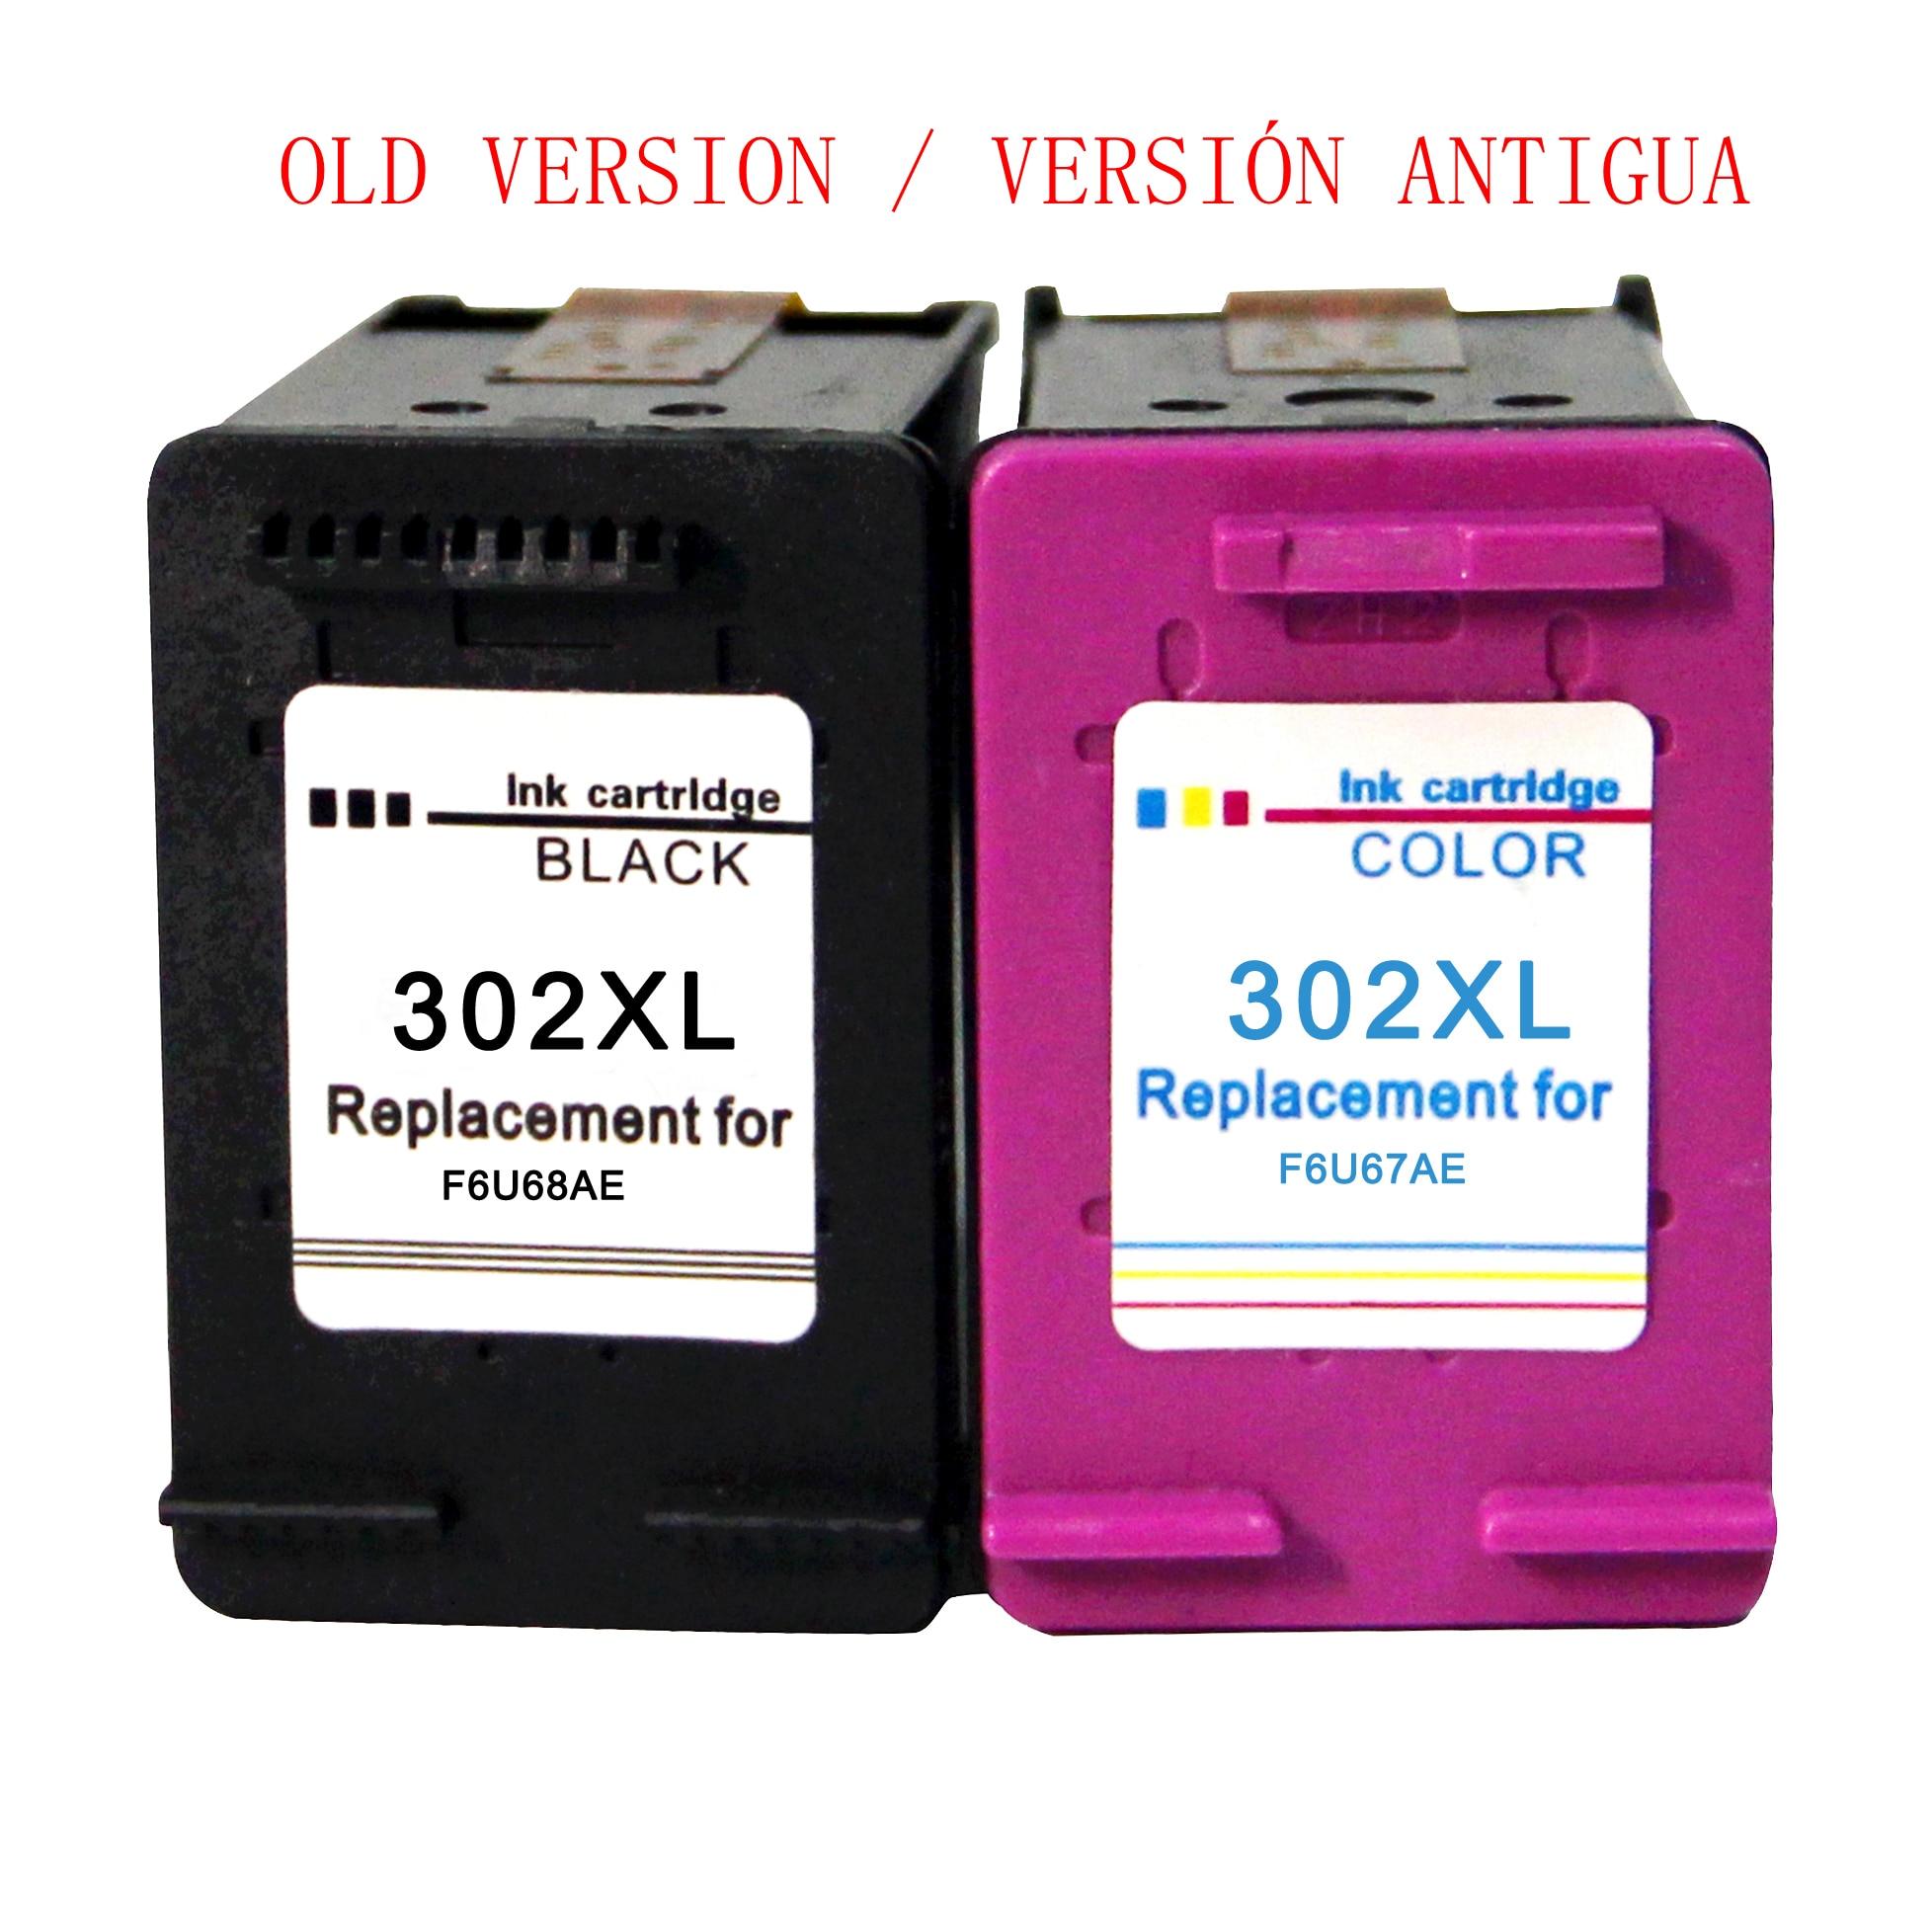 Remanufacturado HP 302 XL Cartuchos de tinta  para HP OfficeJet 3831 3833 DeskJet 1110 2130 3630 3639 3633 3636 Envy 4520 4524